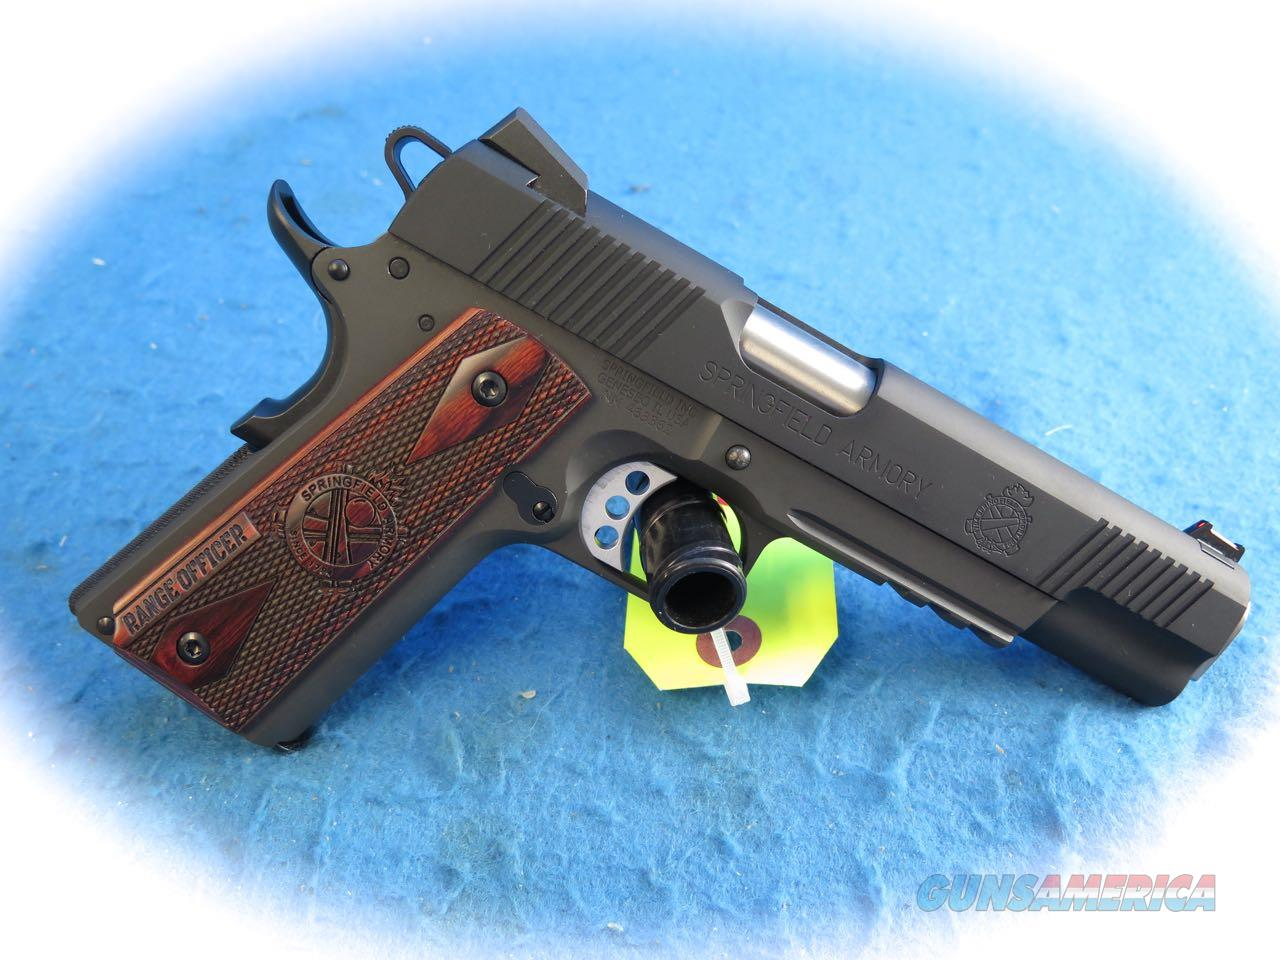 Springfield Armory 1911 Range Officer Operator .45 ACP Pistol PI9131LP **New**  Guns > Pistols > Springfield Armory Pistols > 1911 Type